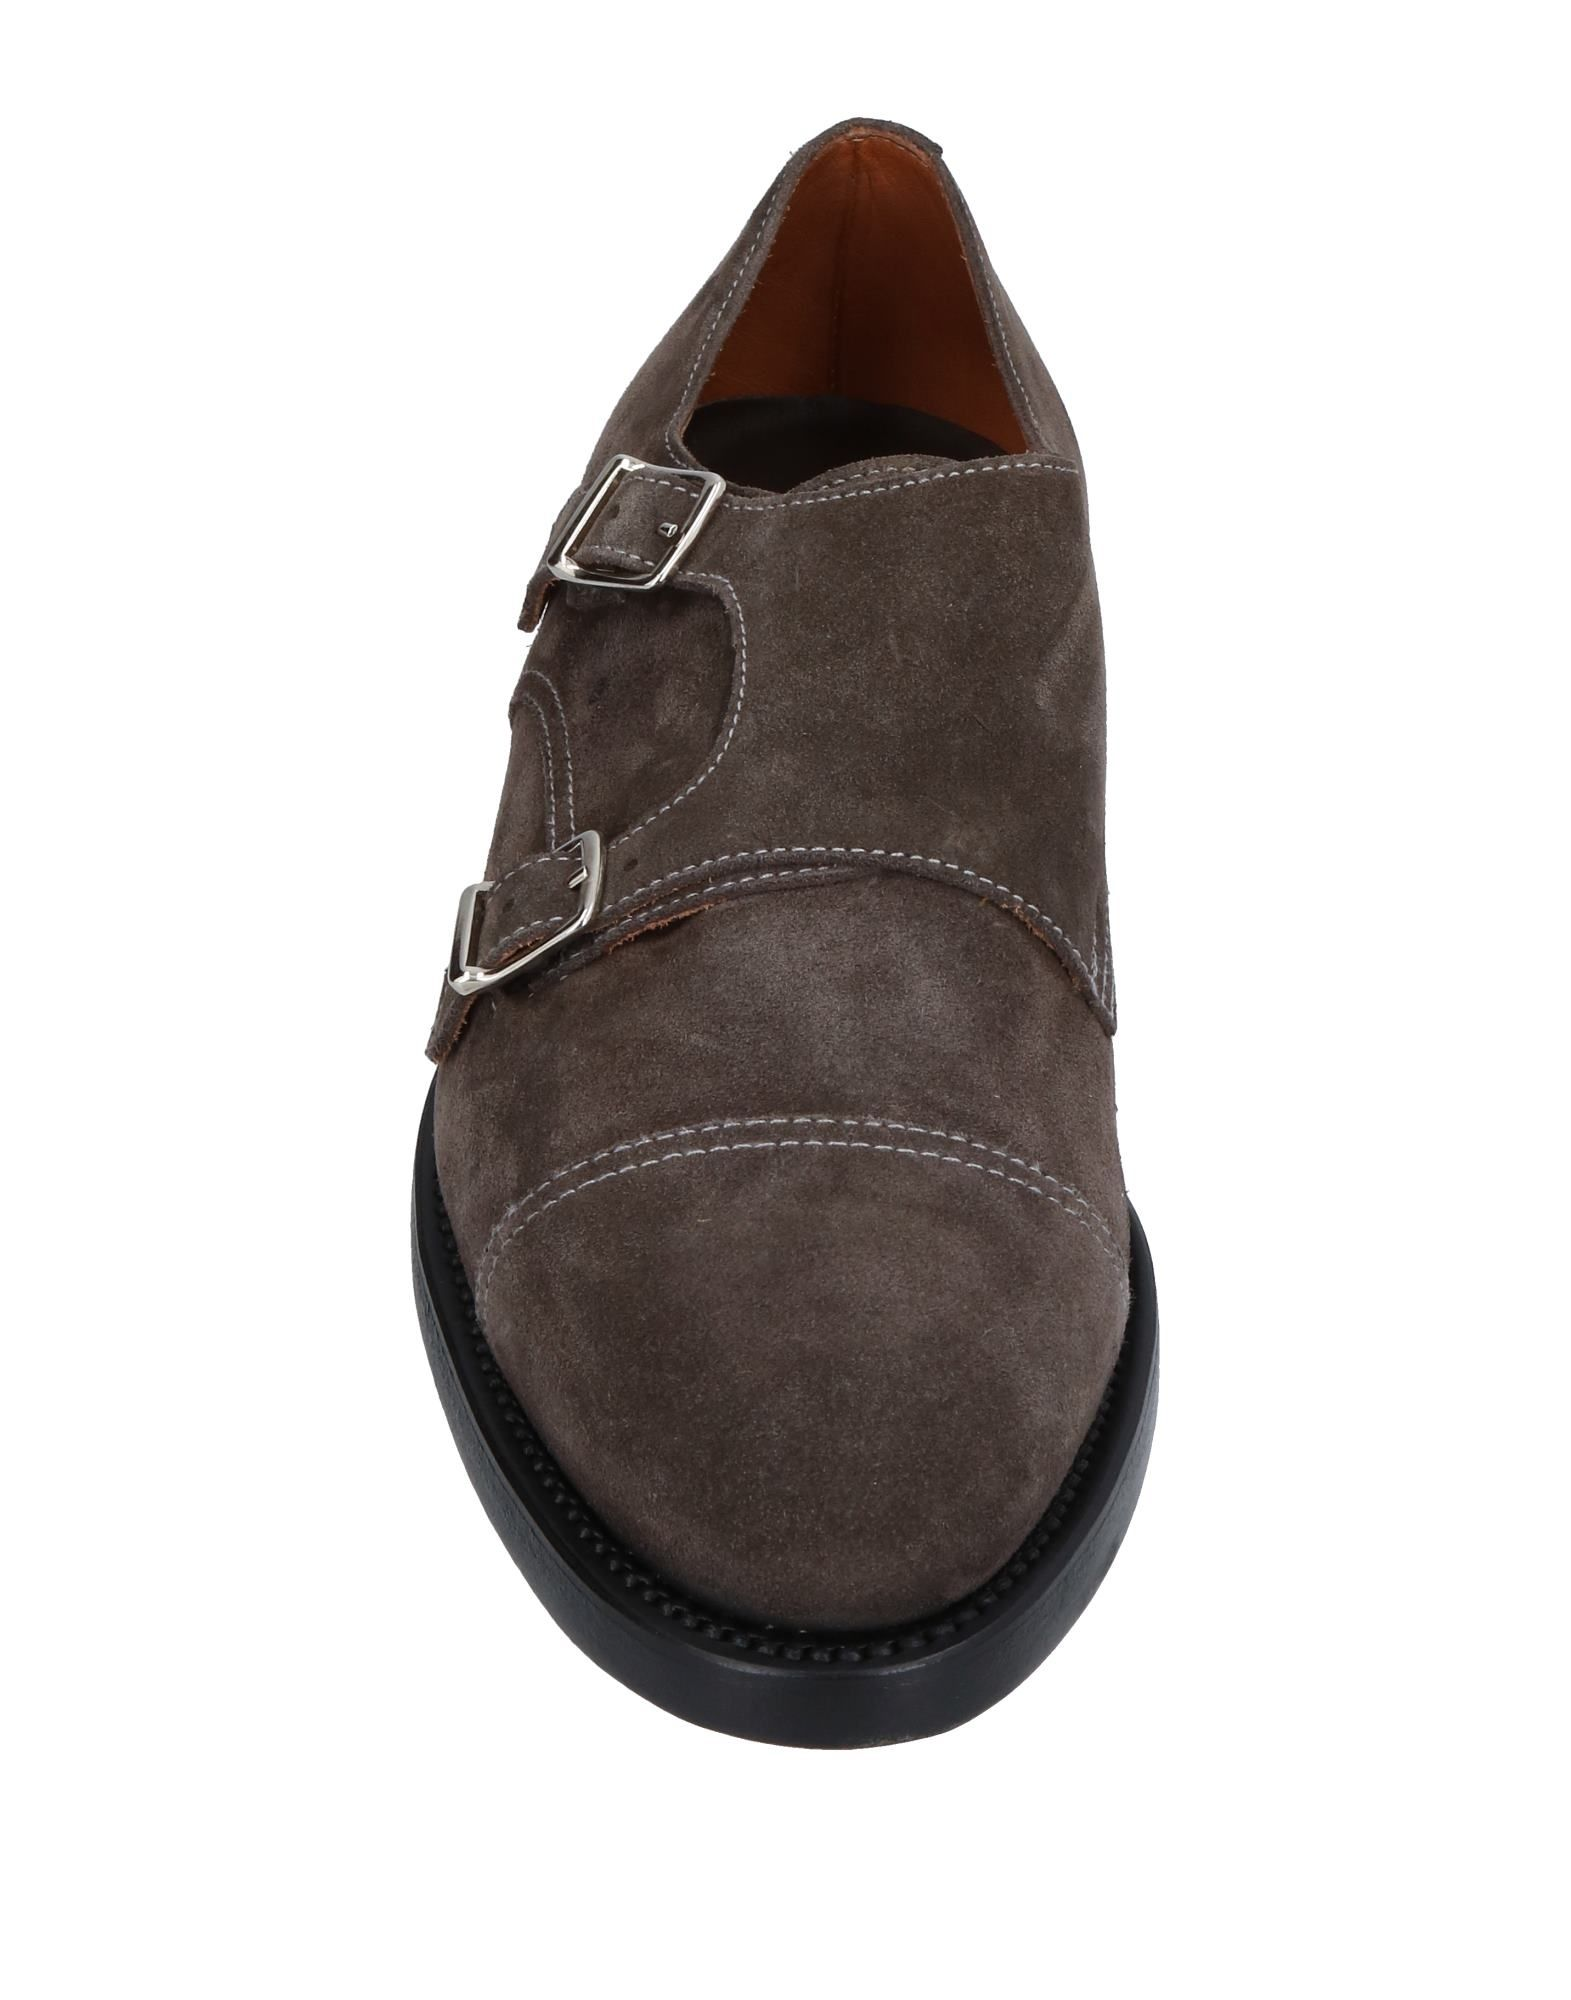 Doucal's Mokassins Herren Schuhe  11393288JR Heiße Schuhe Herren 35e7c7